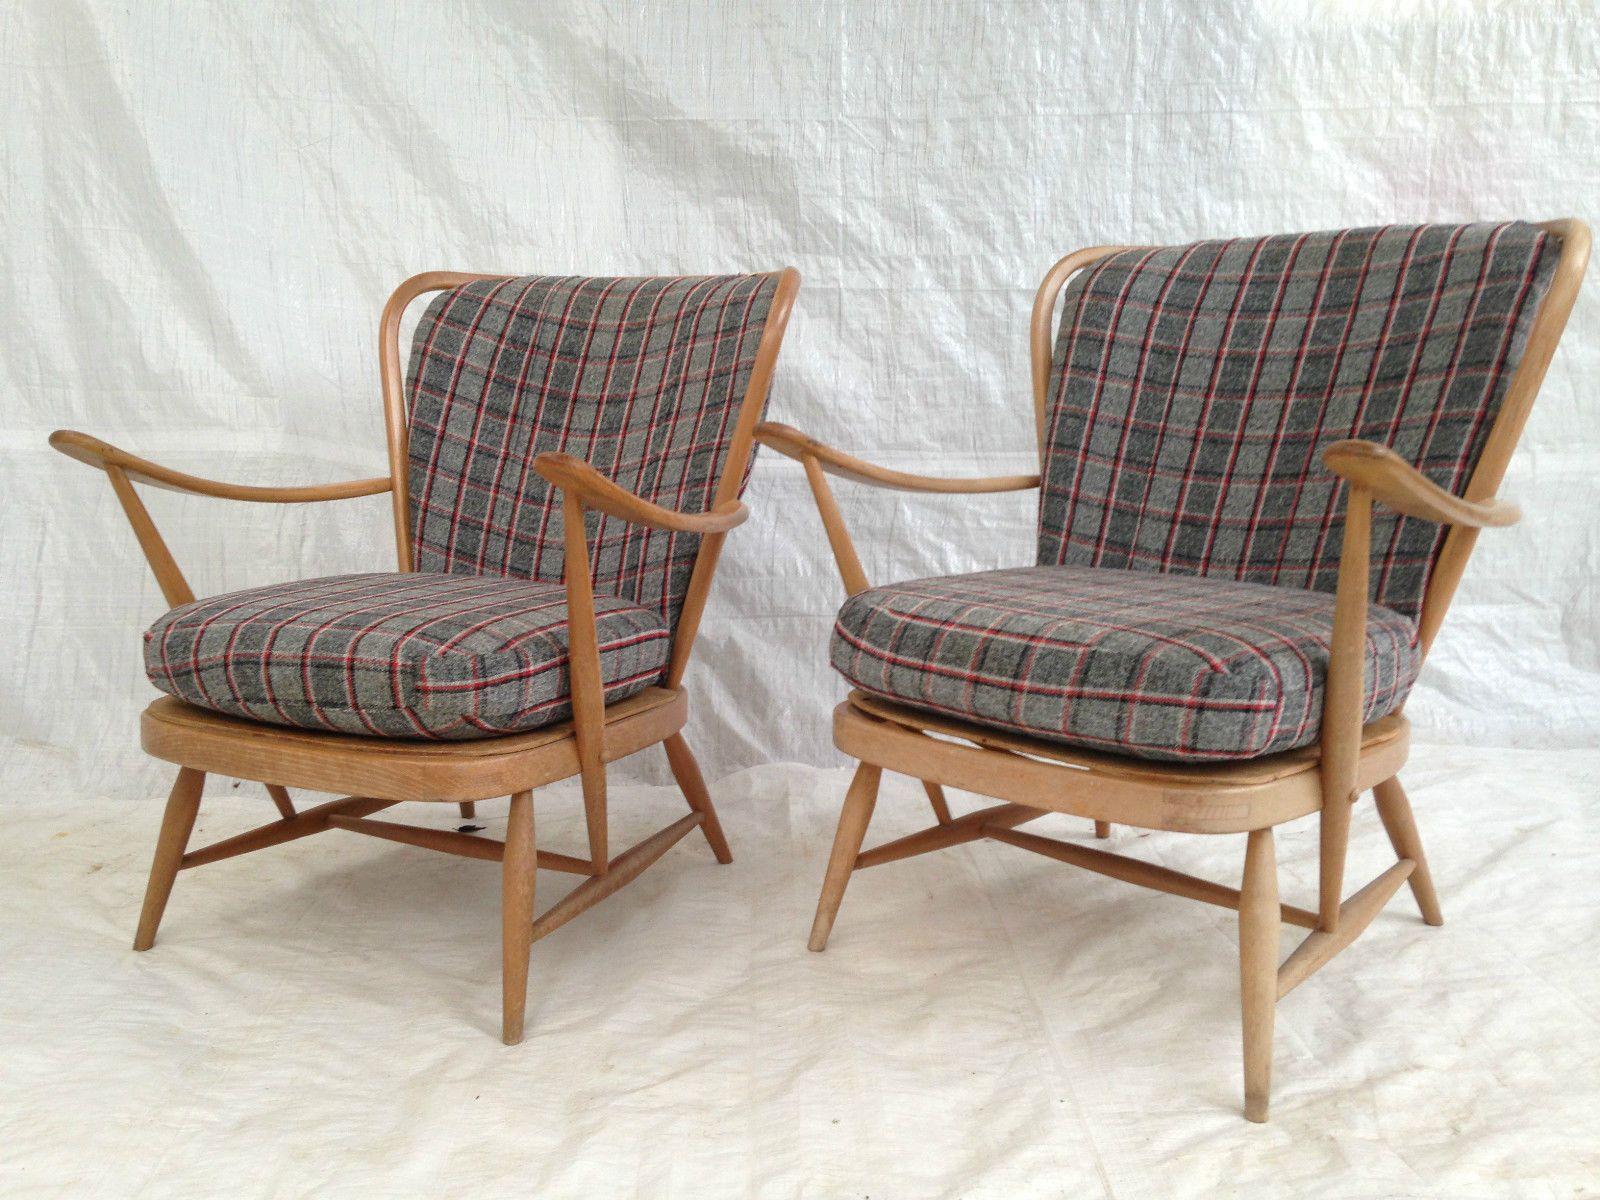 Vintage Retro Mid Century ERCOL Windsor Chair 1950s Blonde ...